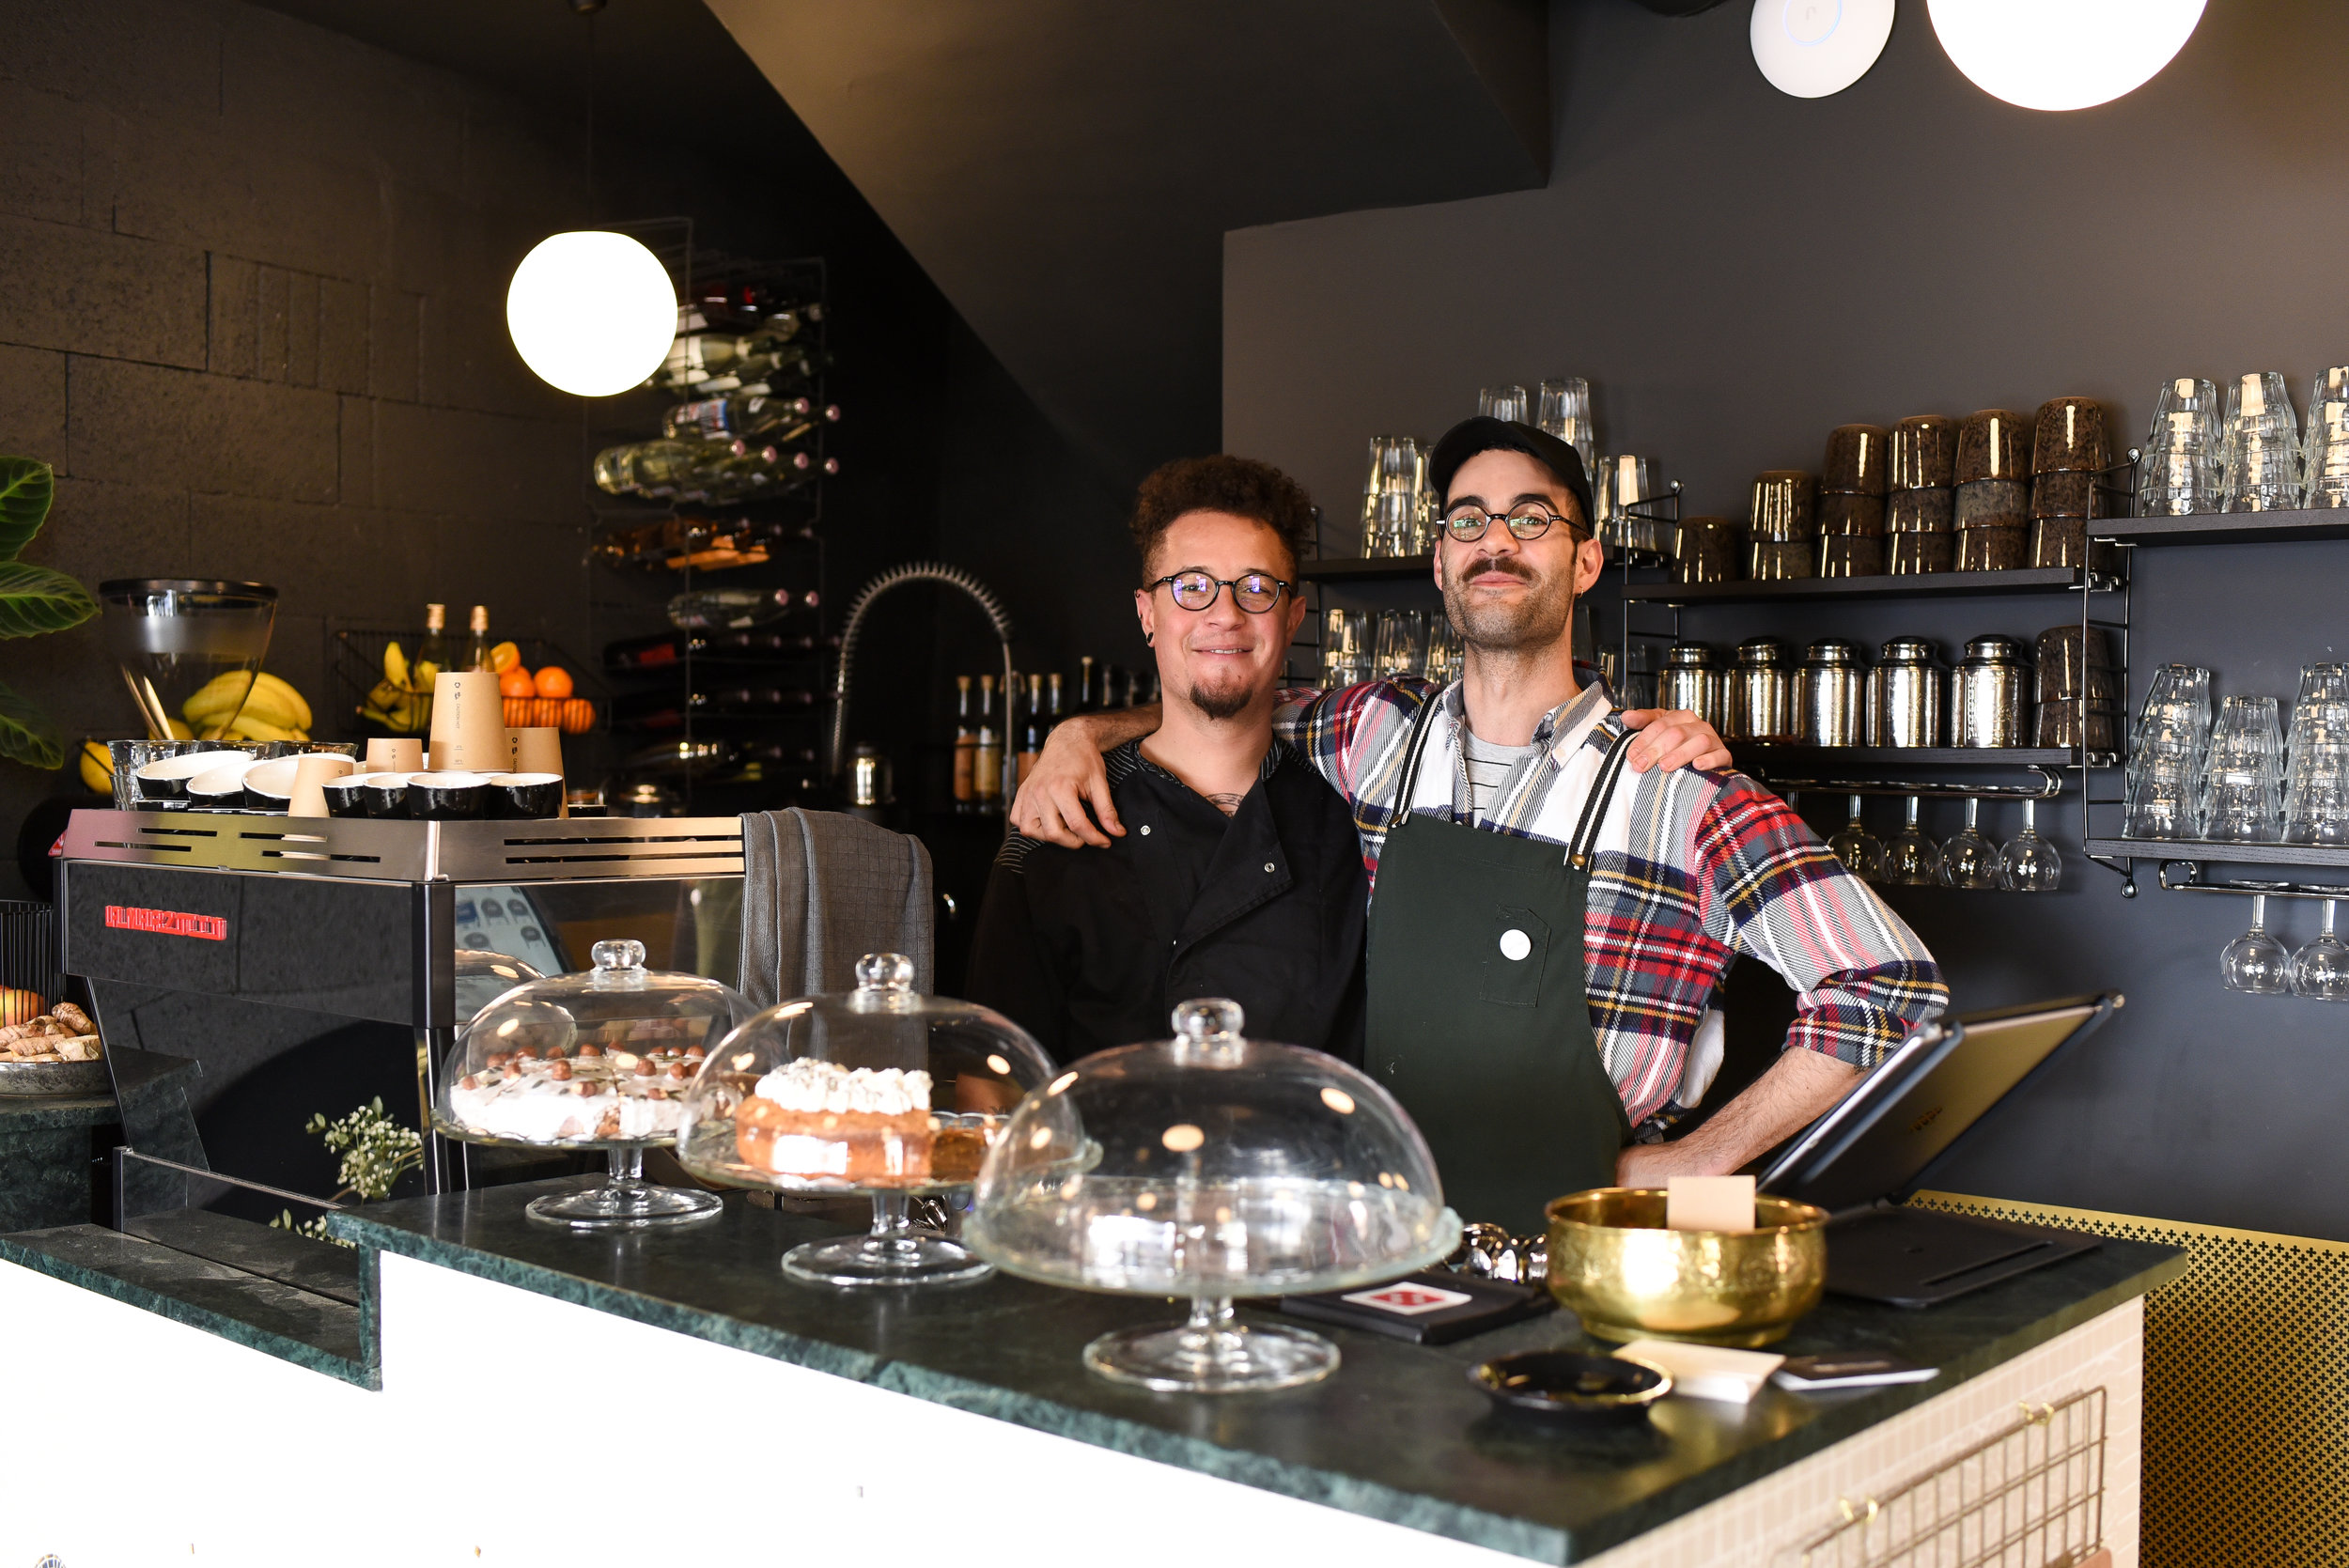 twinky-lizzy-blog-aix-en-provence-cafe-du-temps-restaurant-vegan-18.jpg